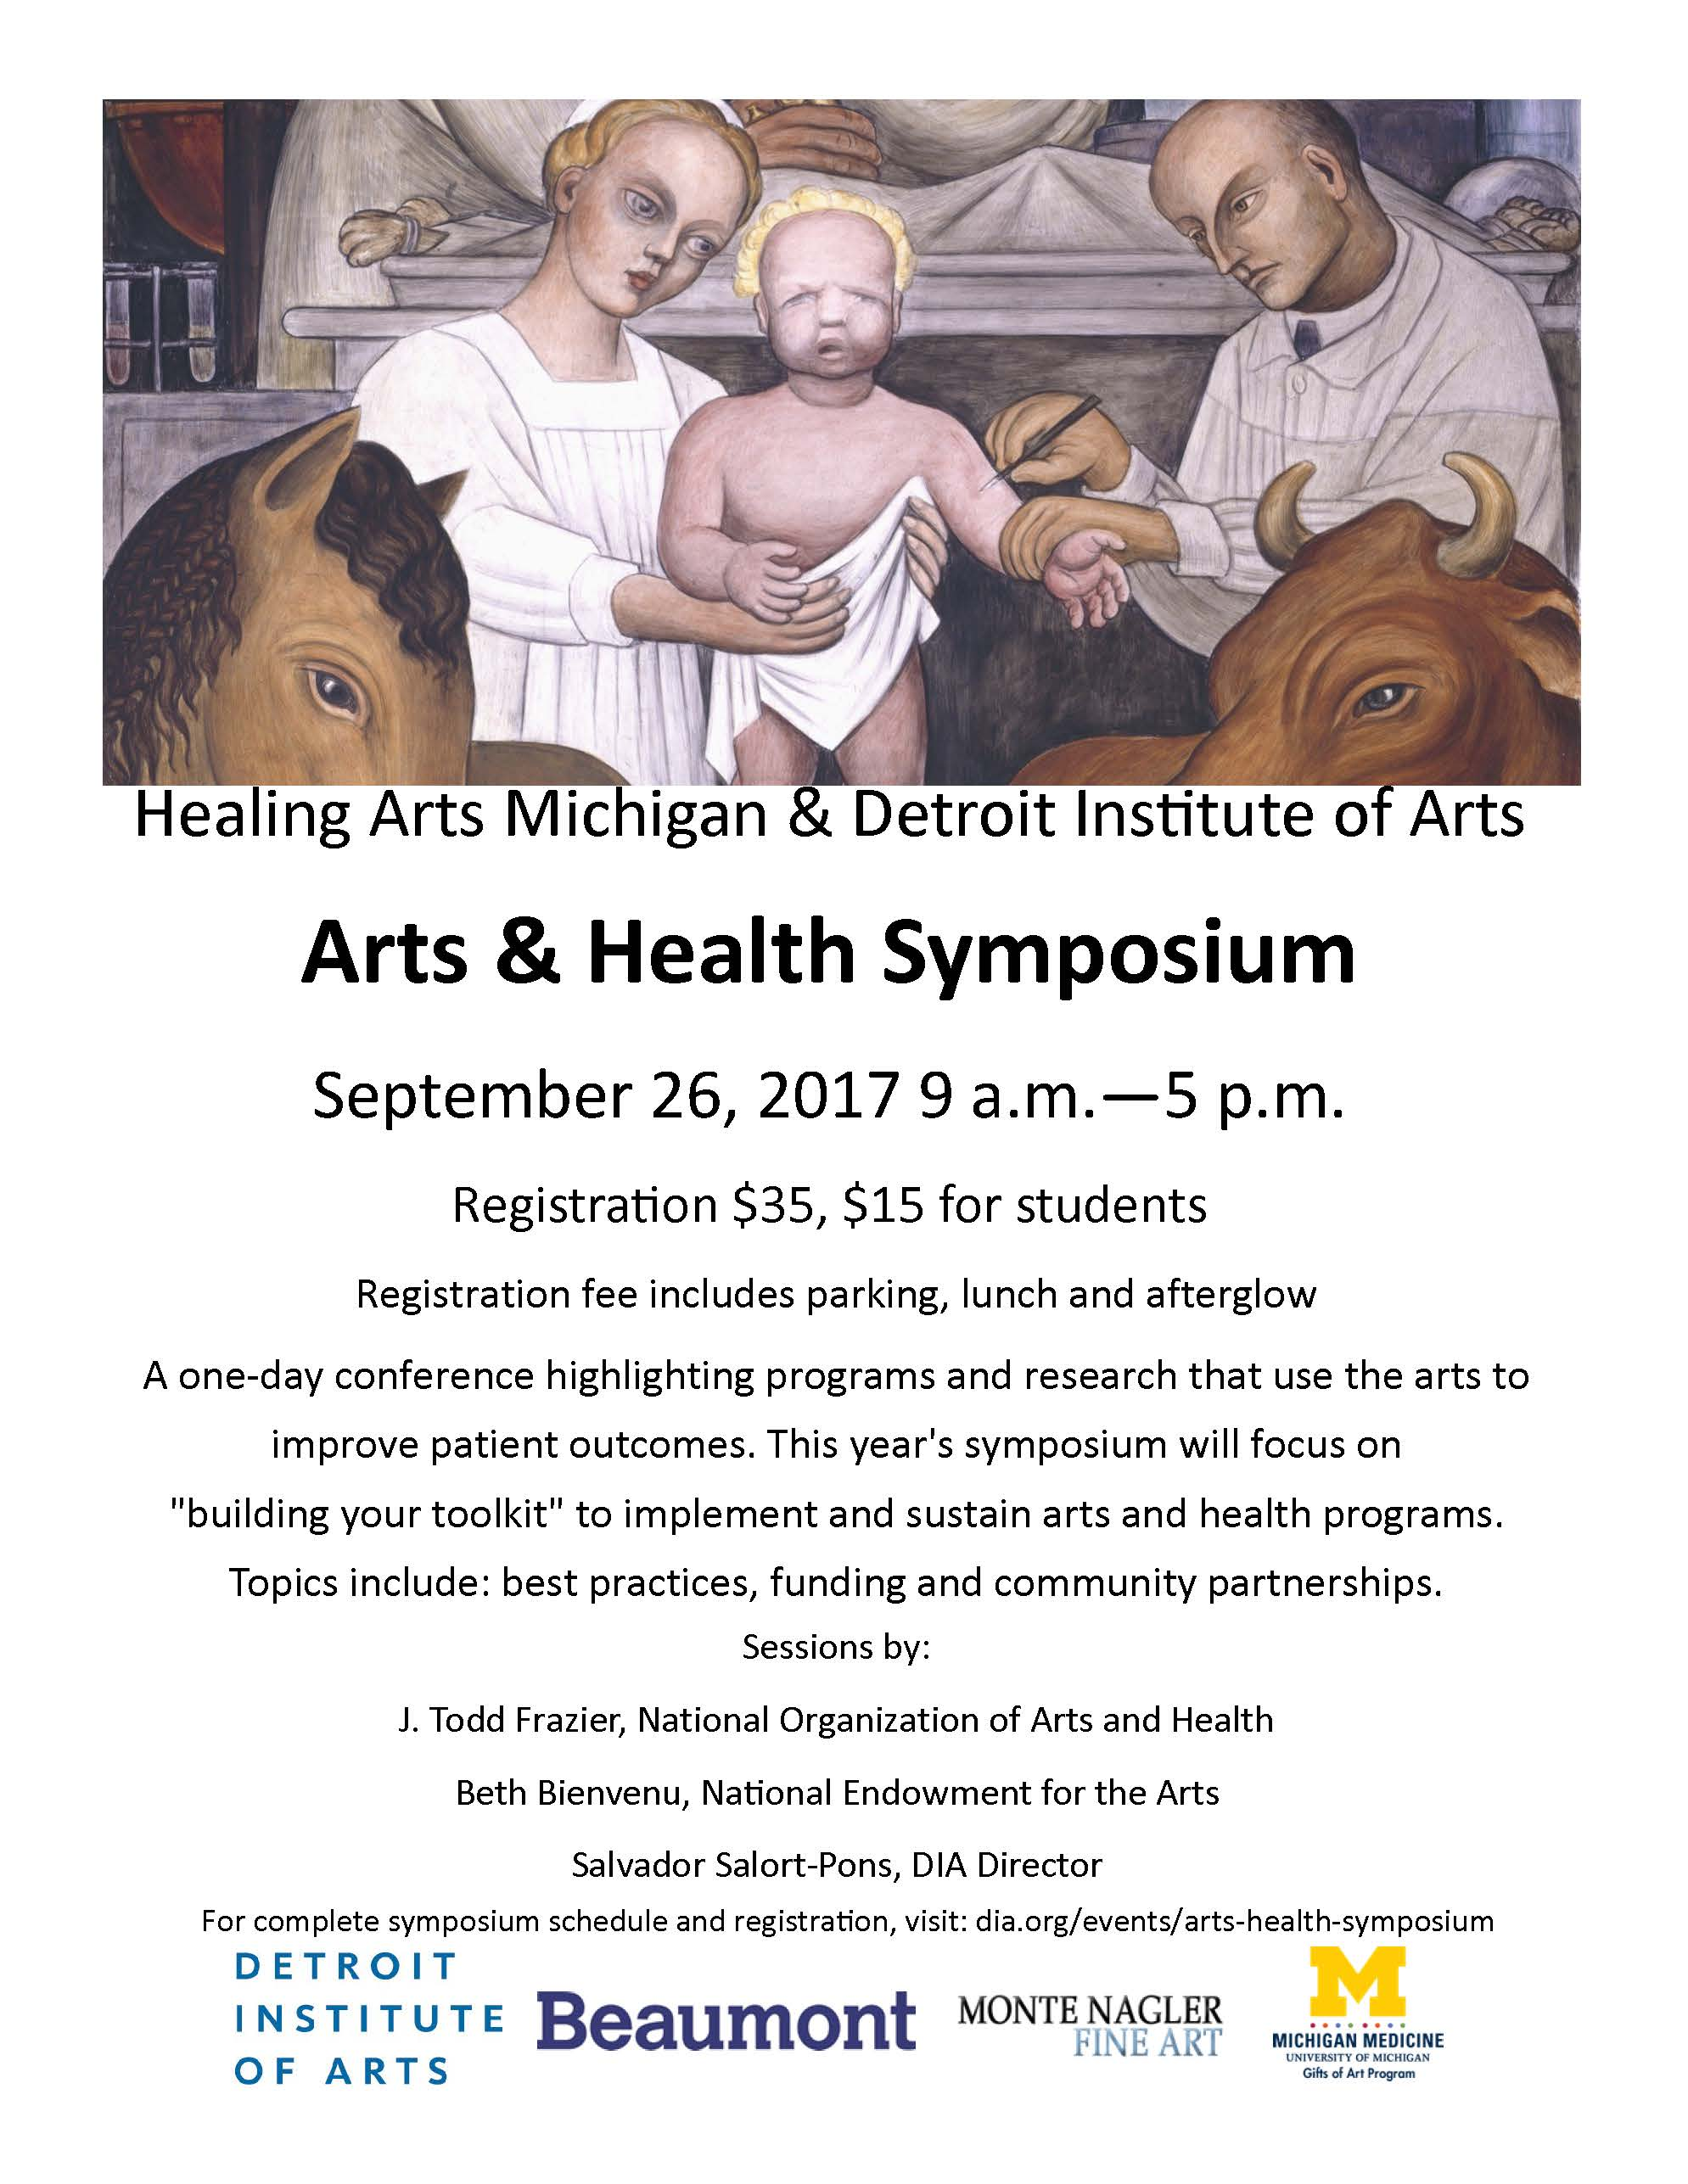 Arts & Health Symposium   Americans for the Arts